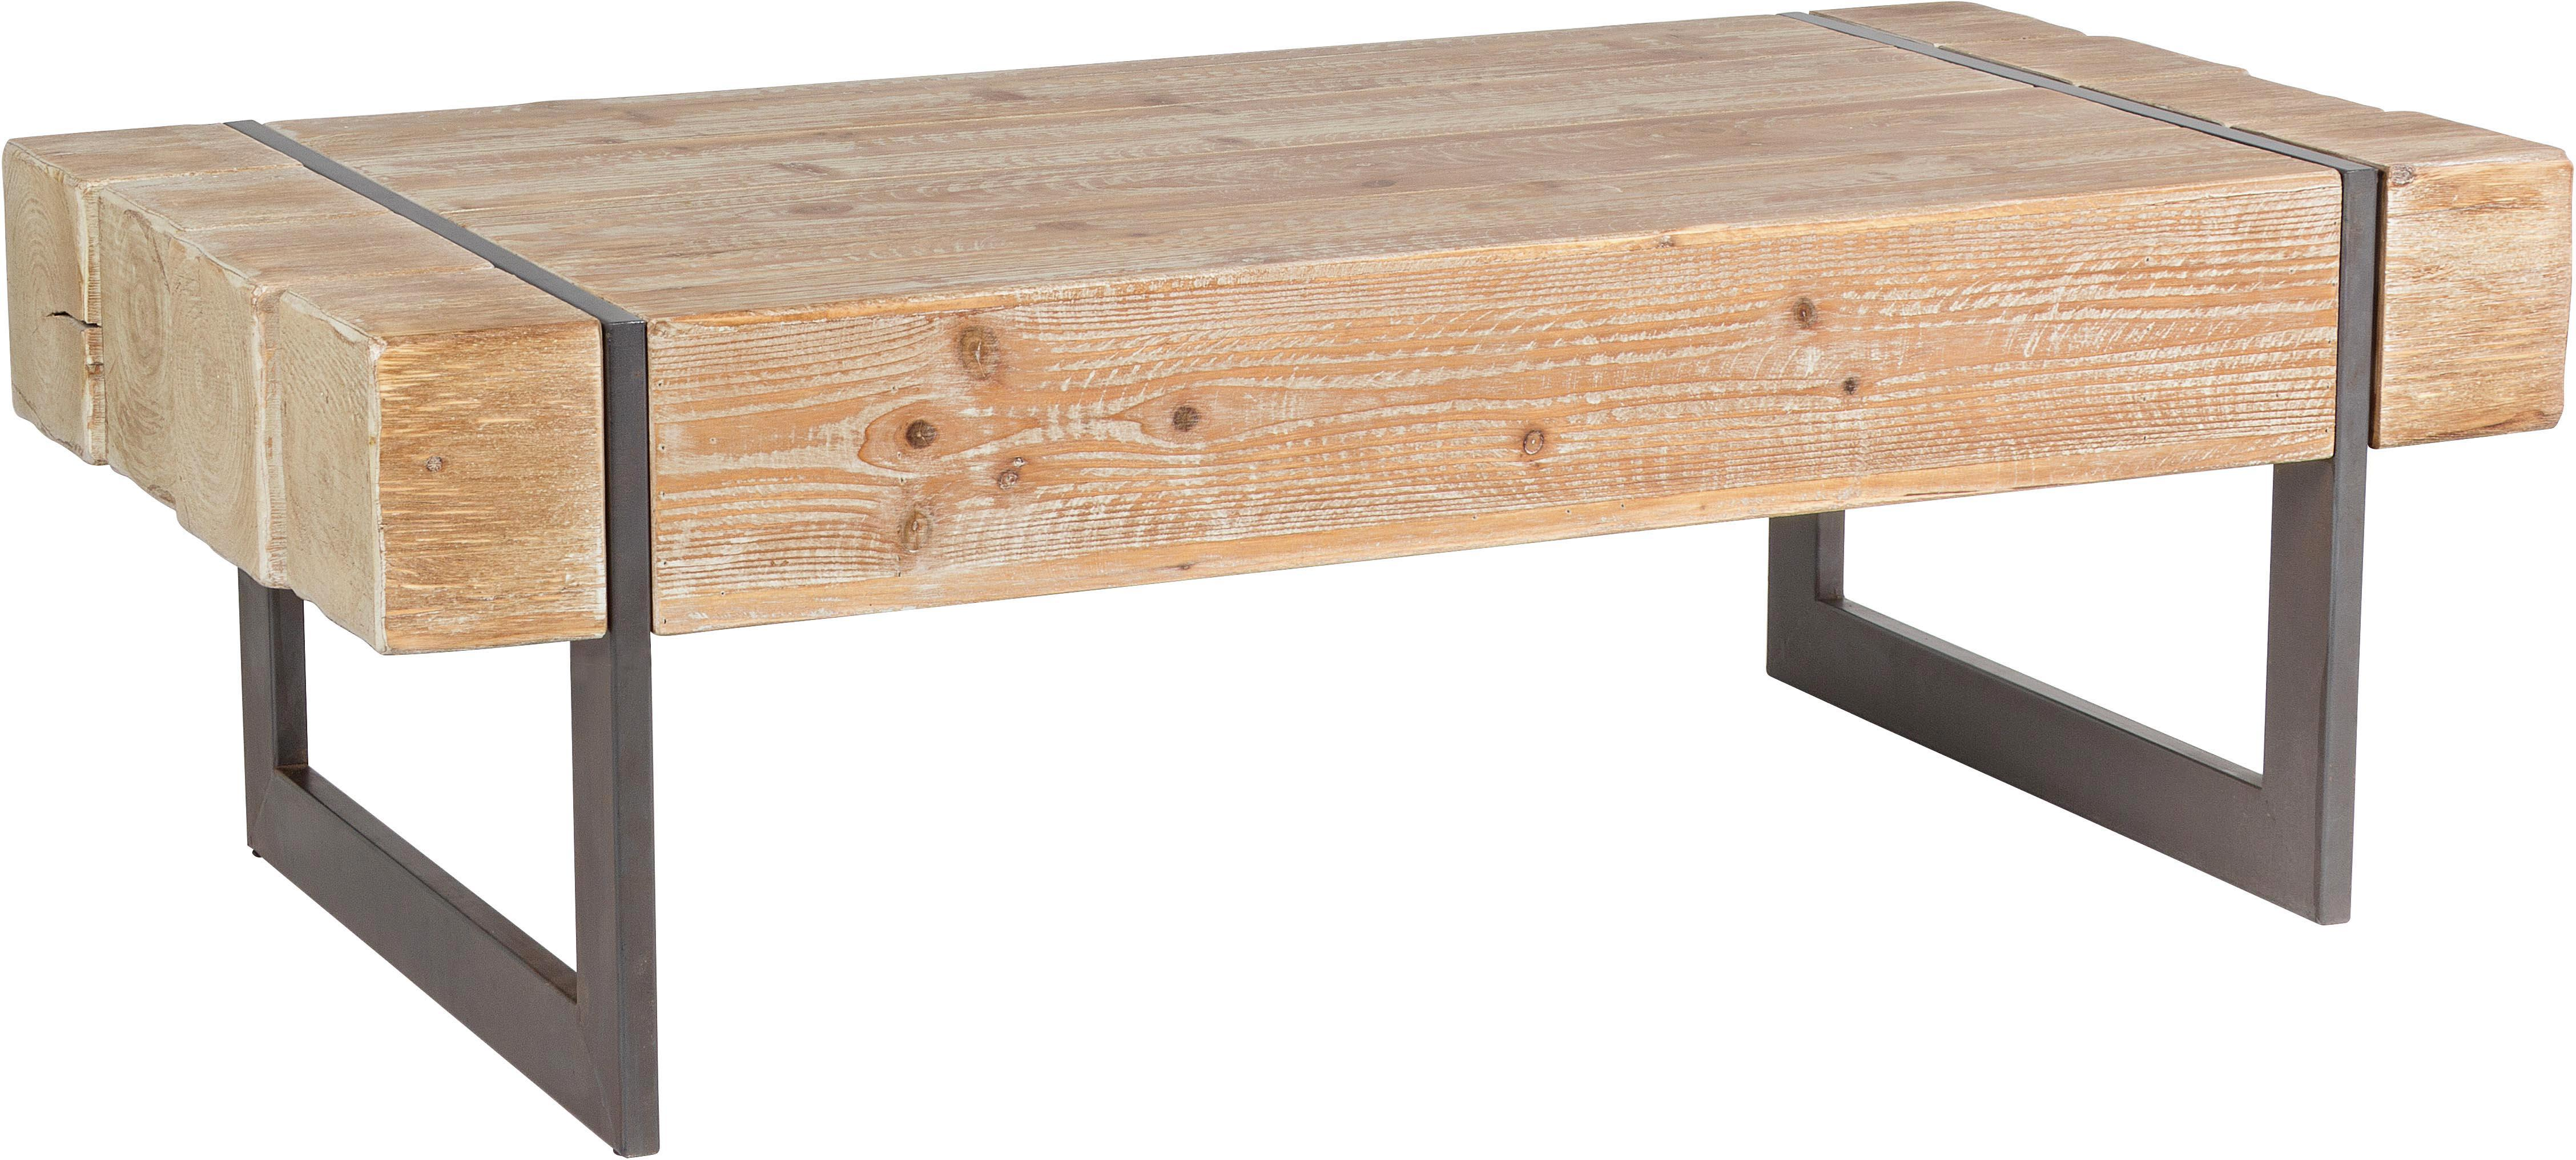 Mesa de centro Garrett, Metal, madera, Beige, gris, An 120 x Al 40 cm